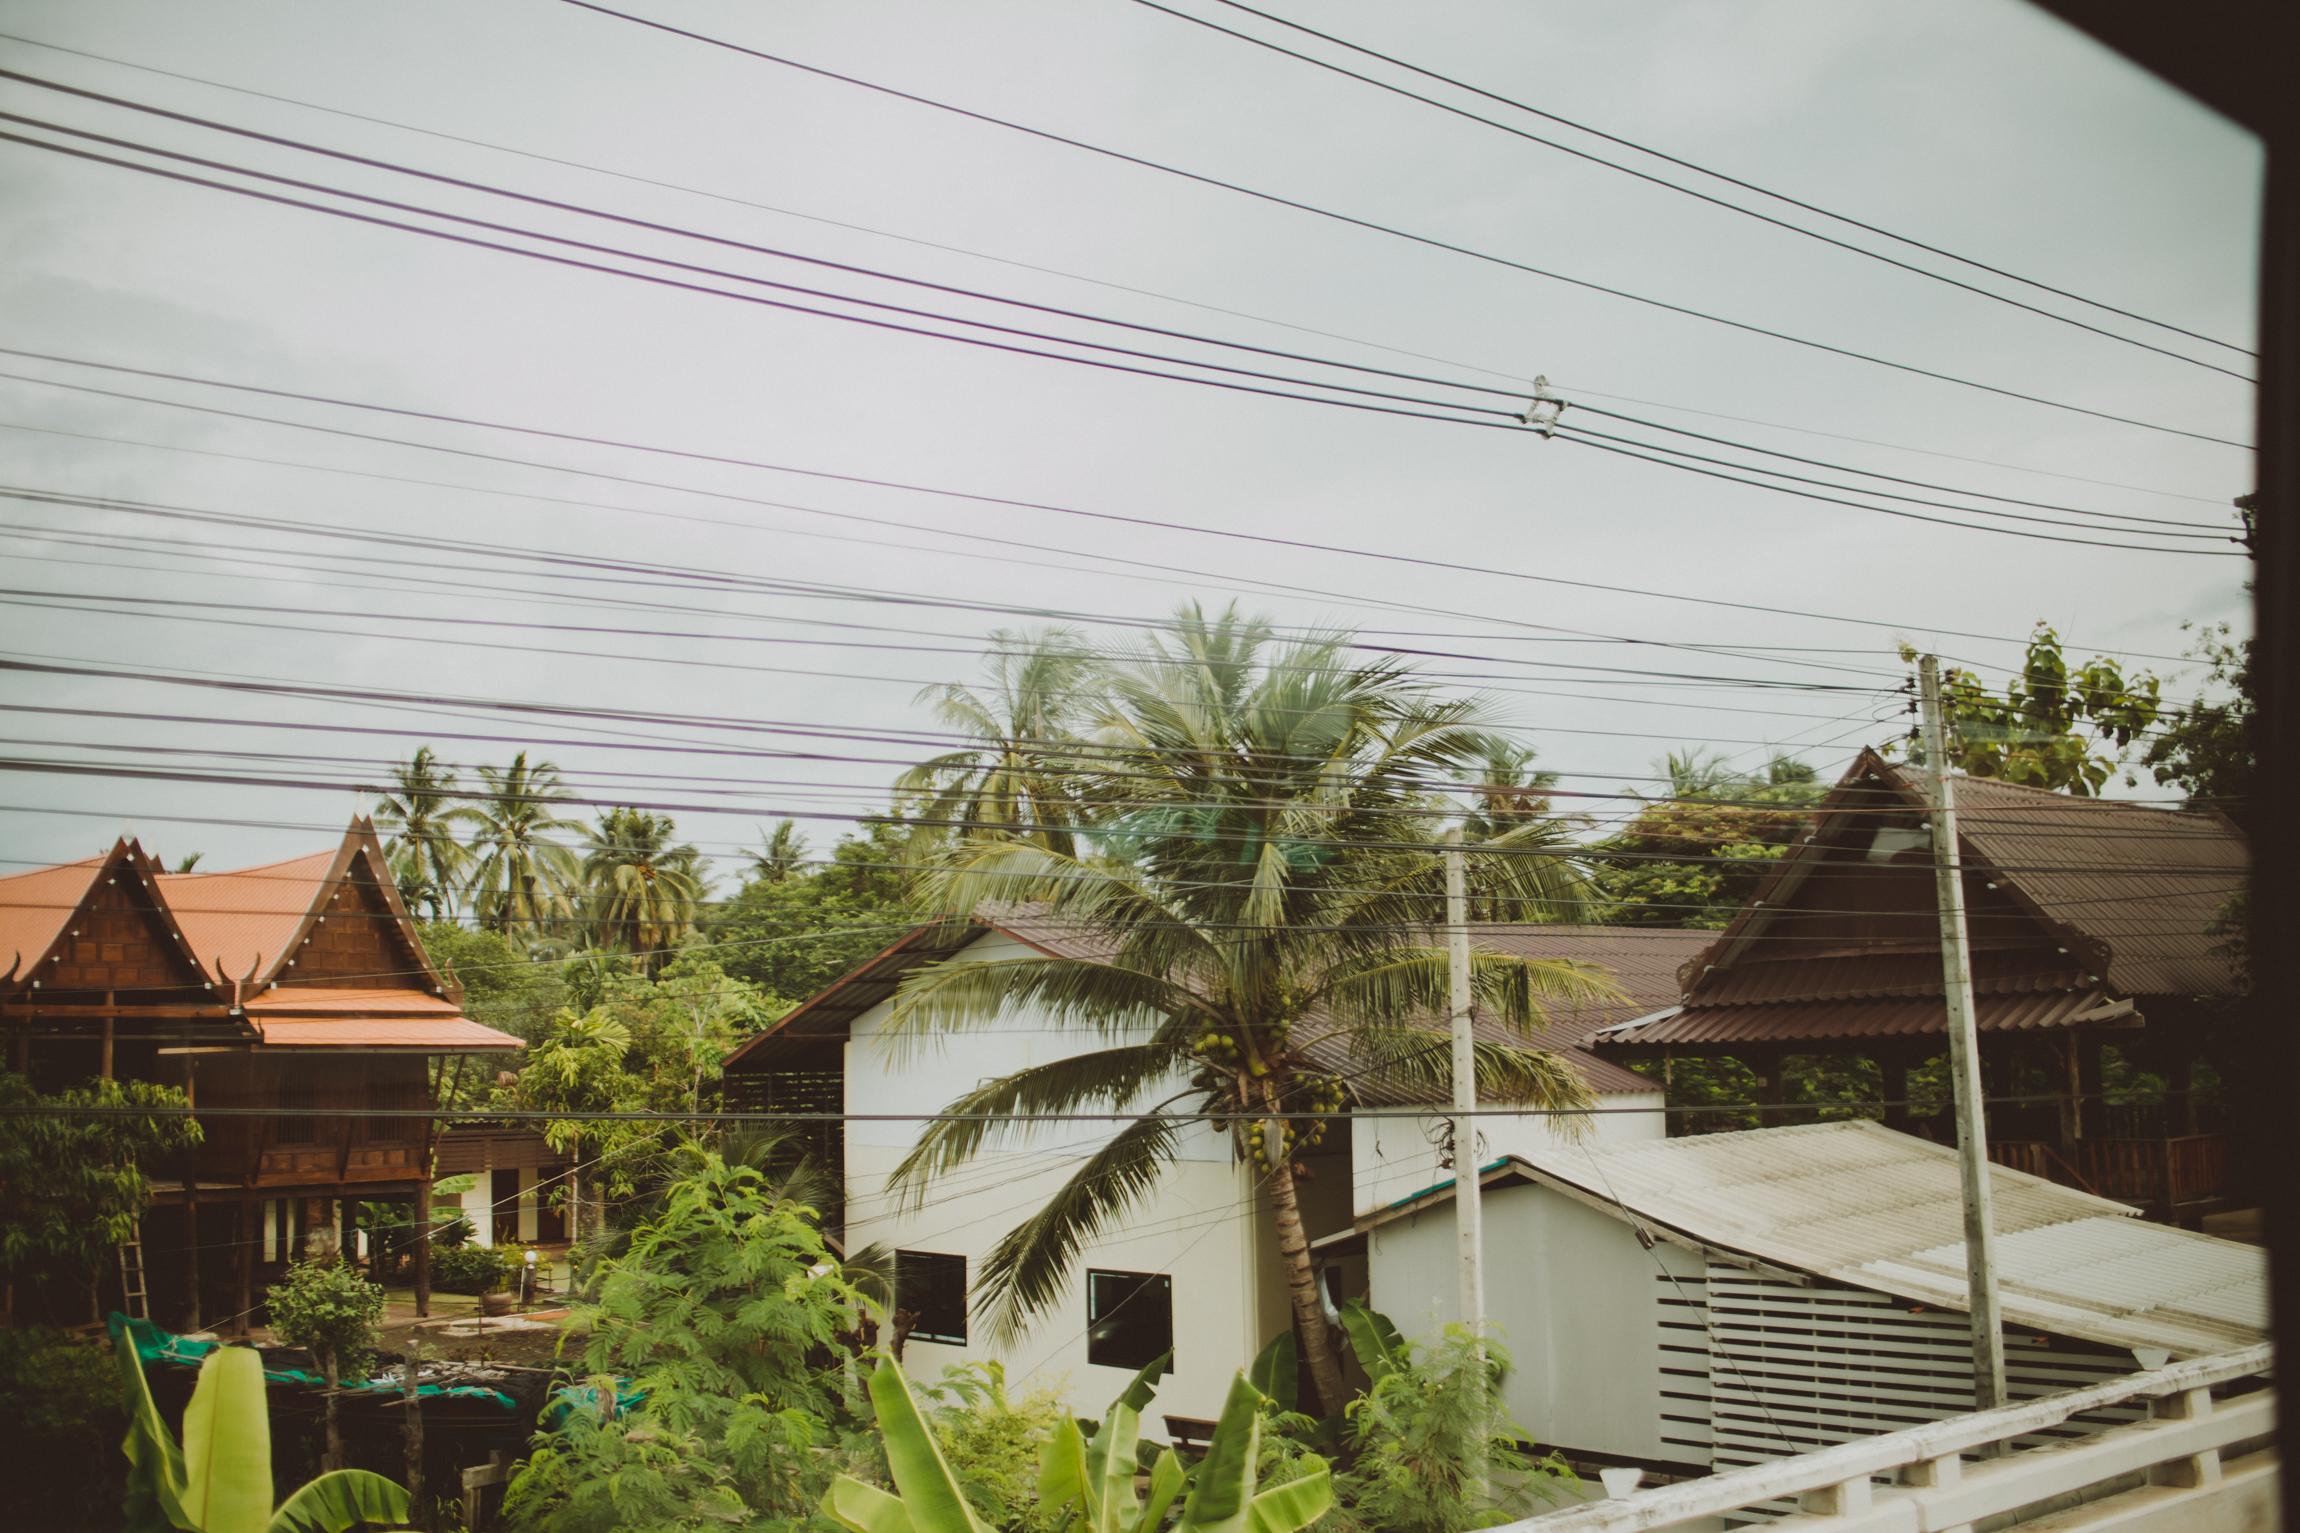 thailand-4-2.jpg